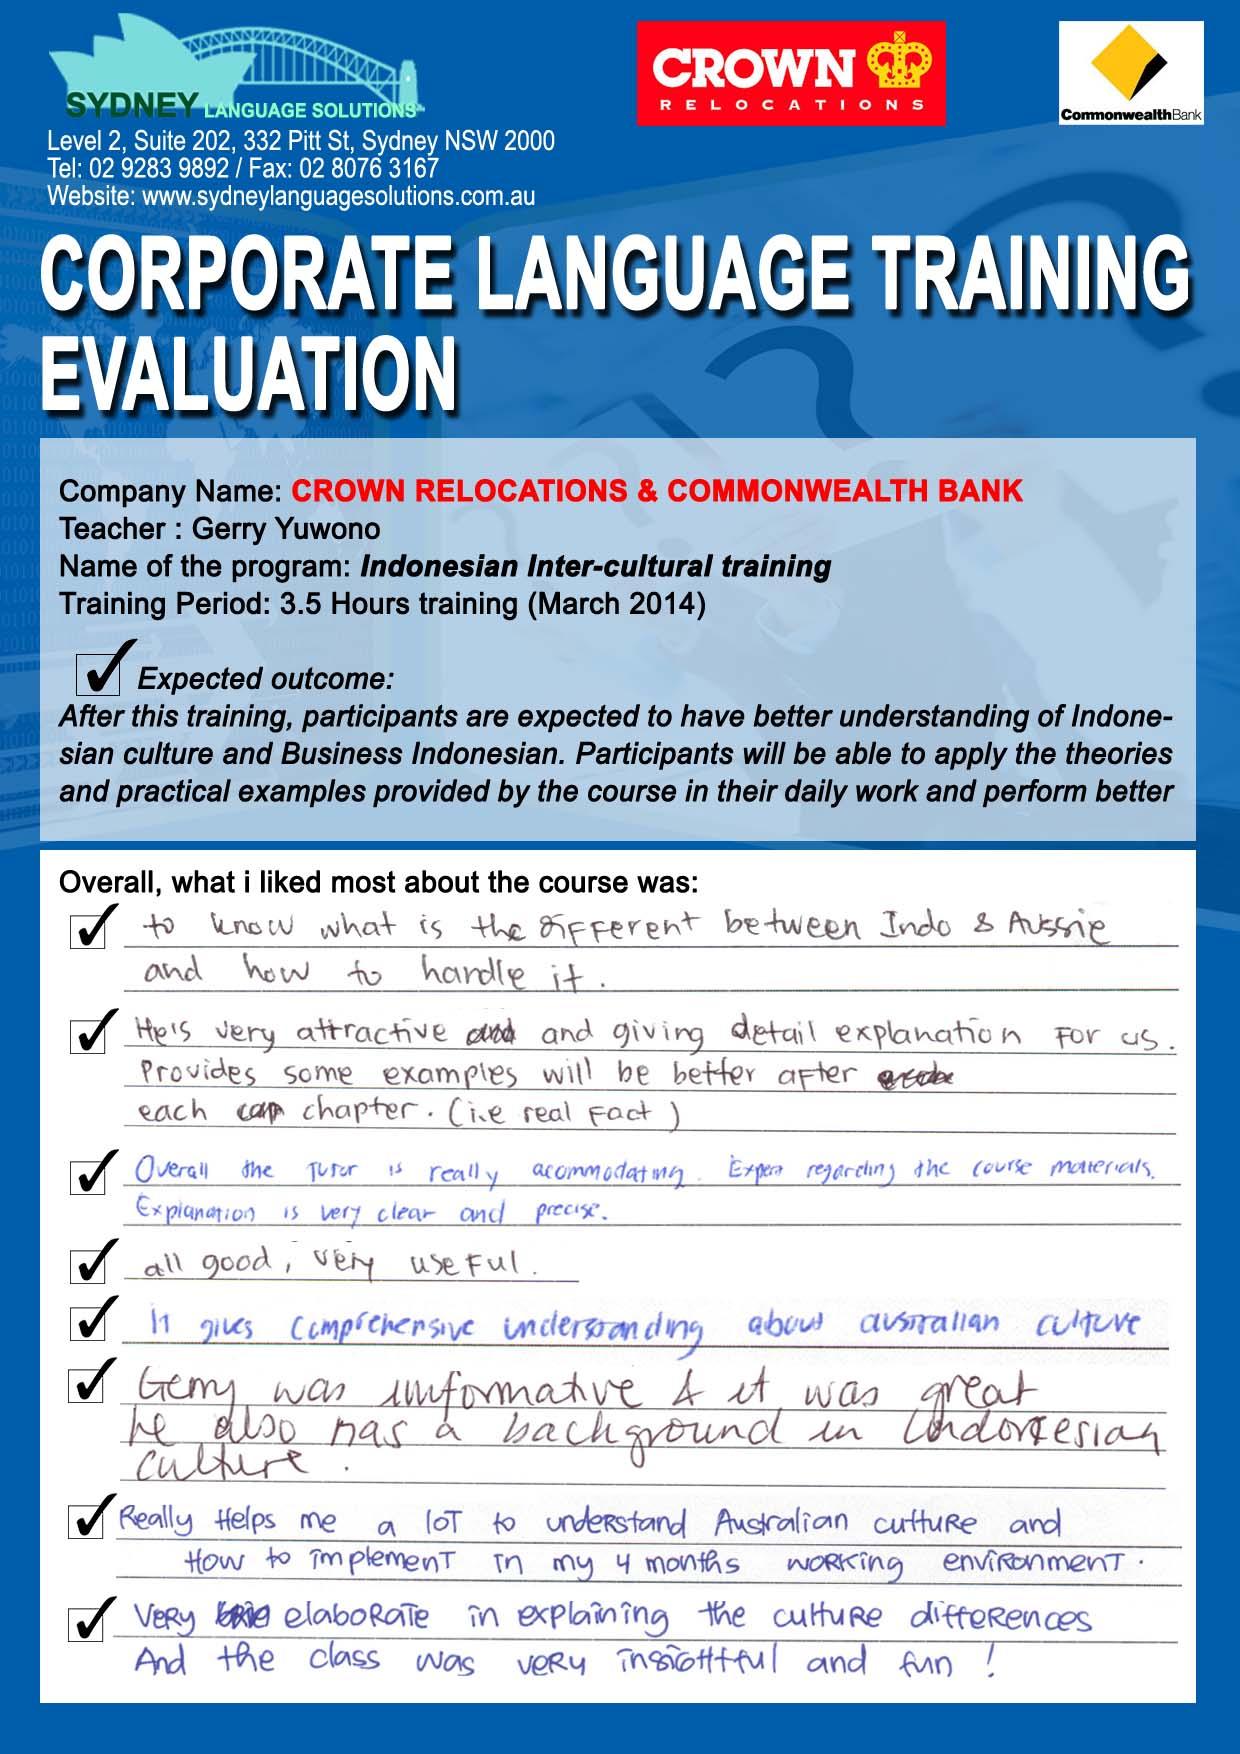 sydney language solutions ptec - photo#27